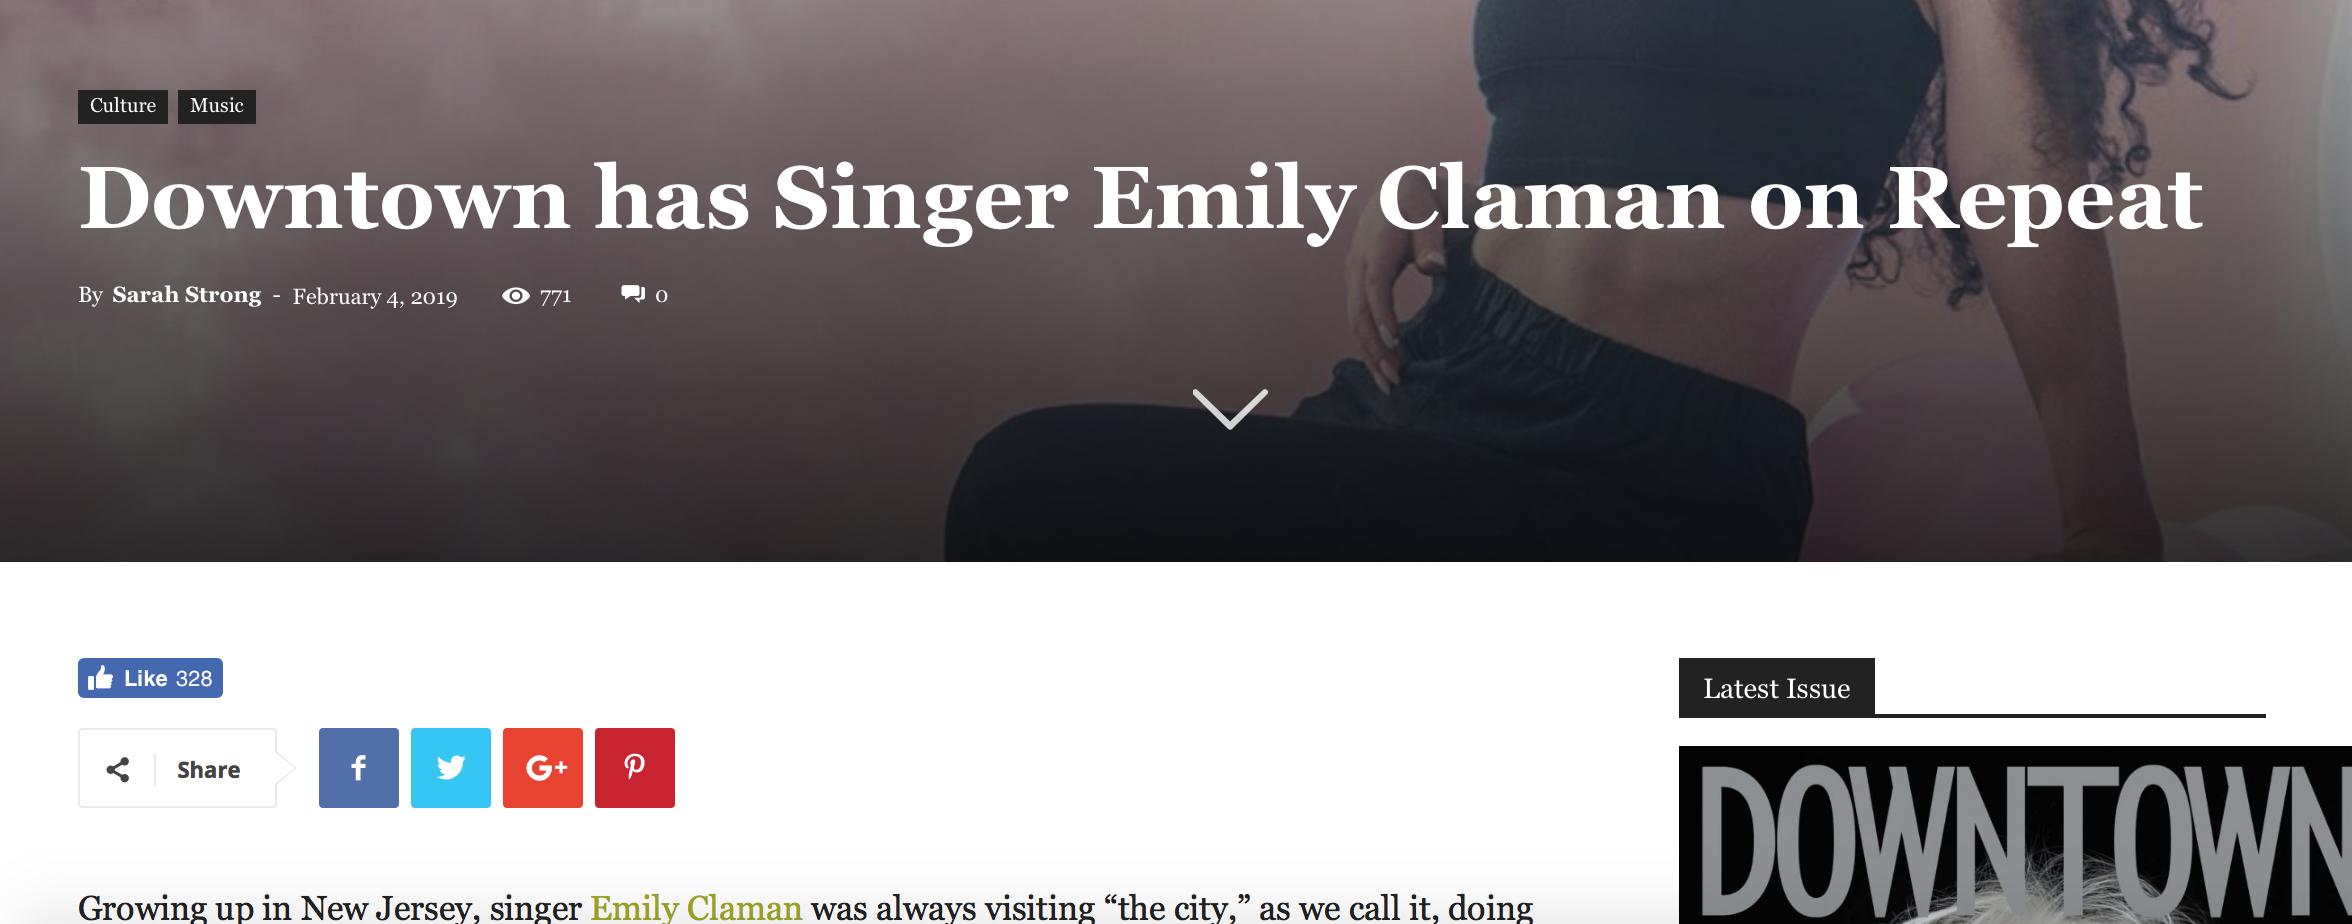 DOWNTOWN MAGAZINE - https://www.downtownmagazinenyc.com/singer-emily-claman/?fbclid=IwAR1jJmOFPyBVyadNtRkRHNaB21399-sjCtl4gvdjCh81d7KcFy4iiIQkOHo